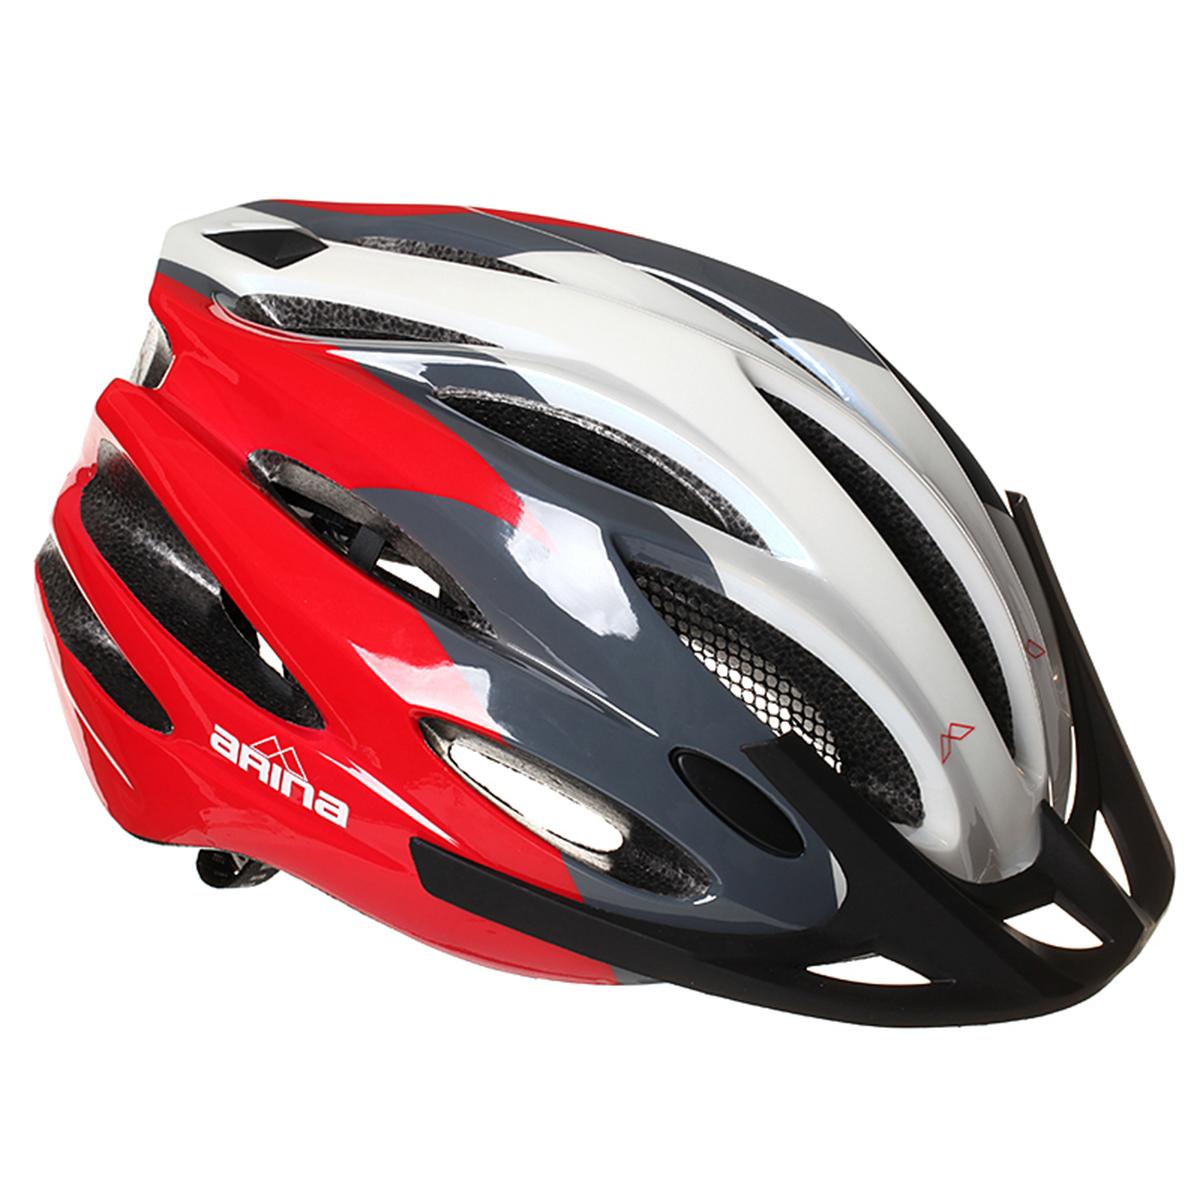 Arina Quest Helmet Bike Cycle Bicycle White Blue Red Medium 54-58Cm Yj-29